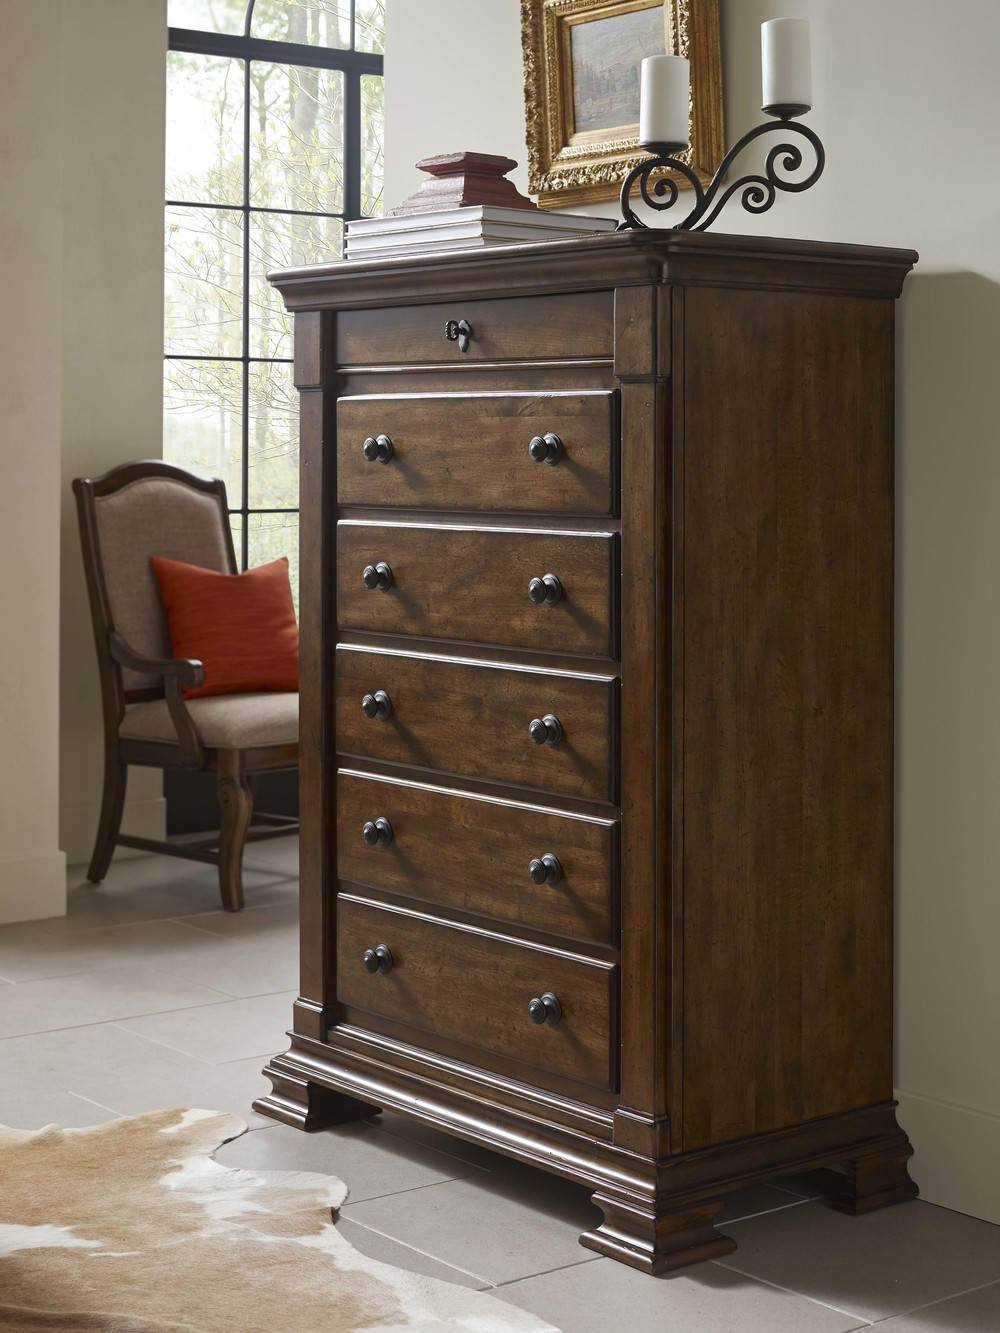 Kincaid Furniture - Portolone Drawer Chest